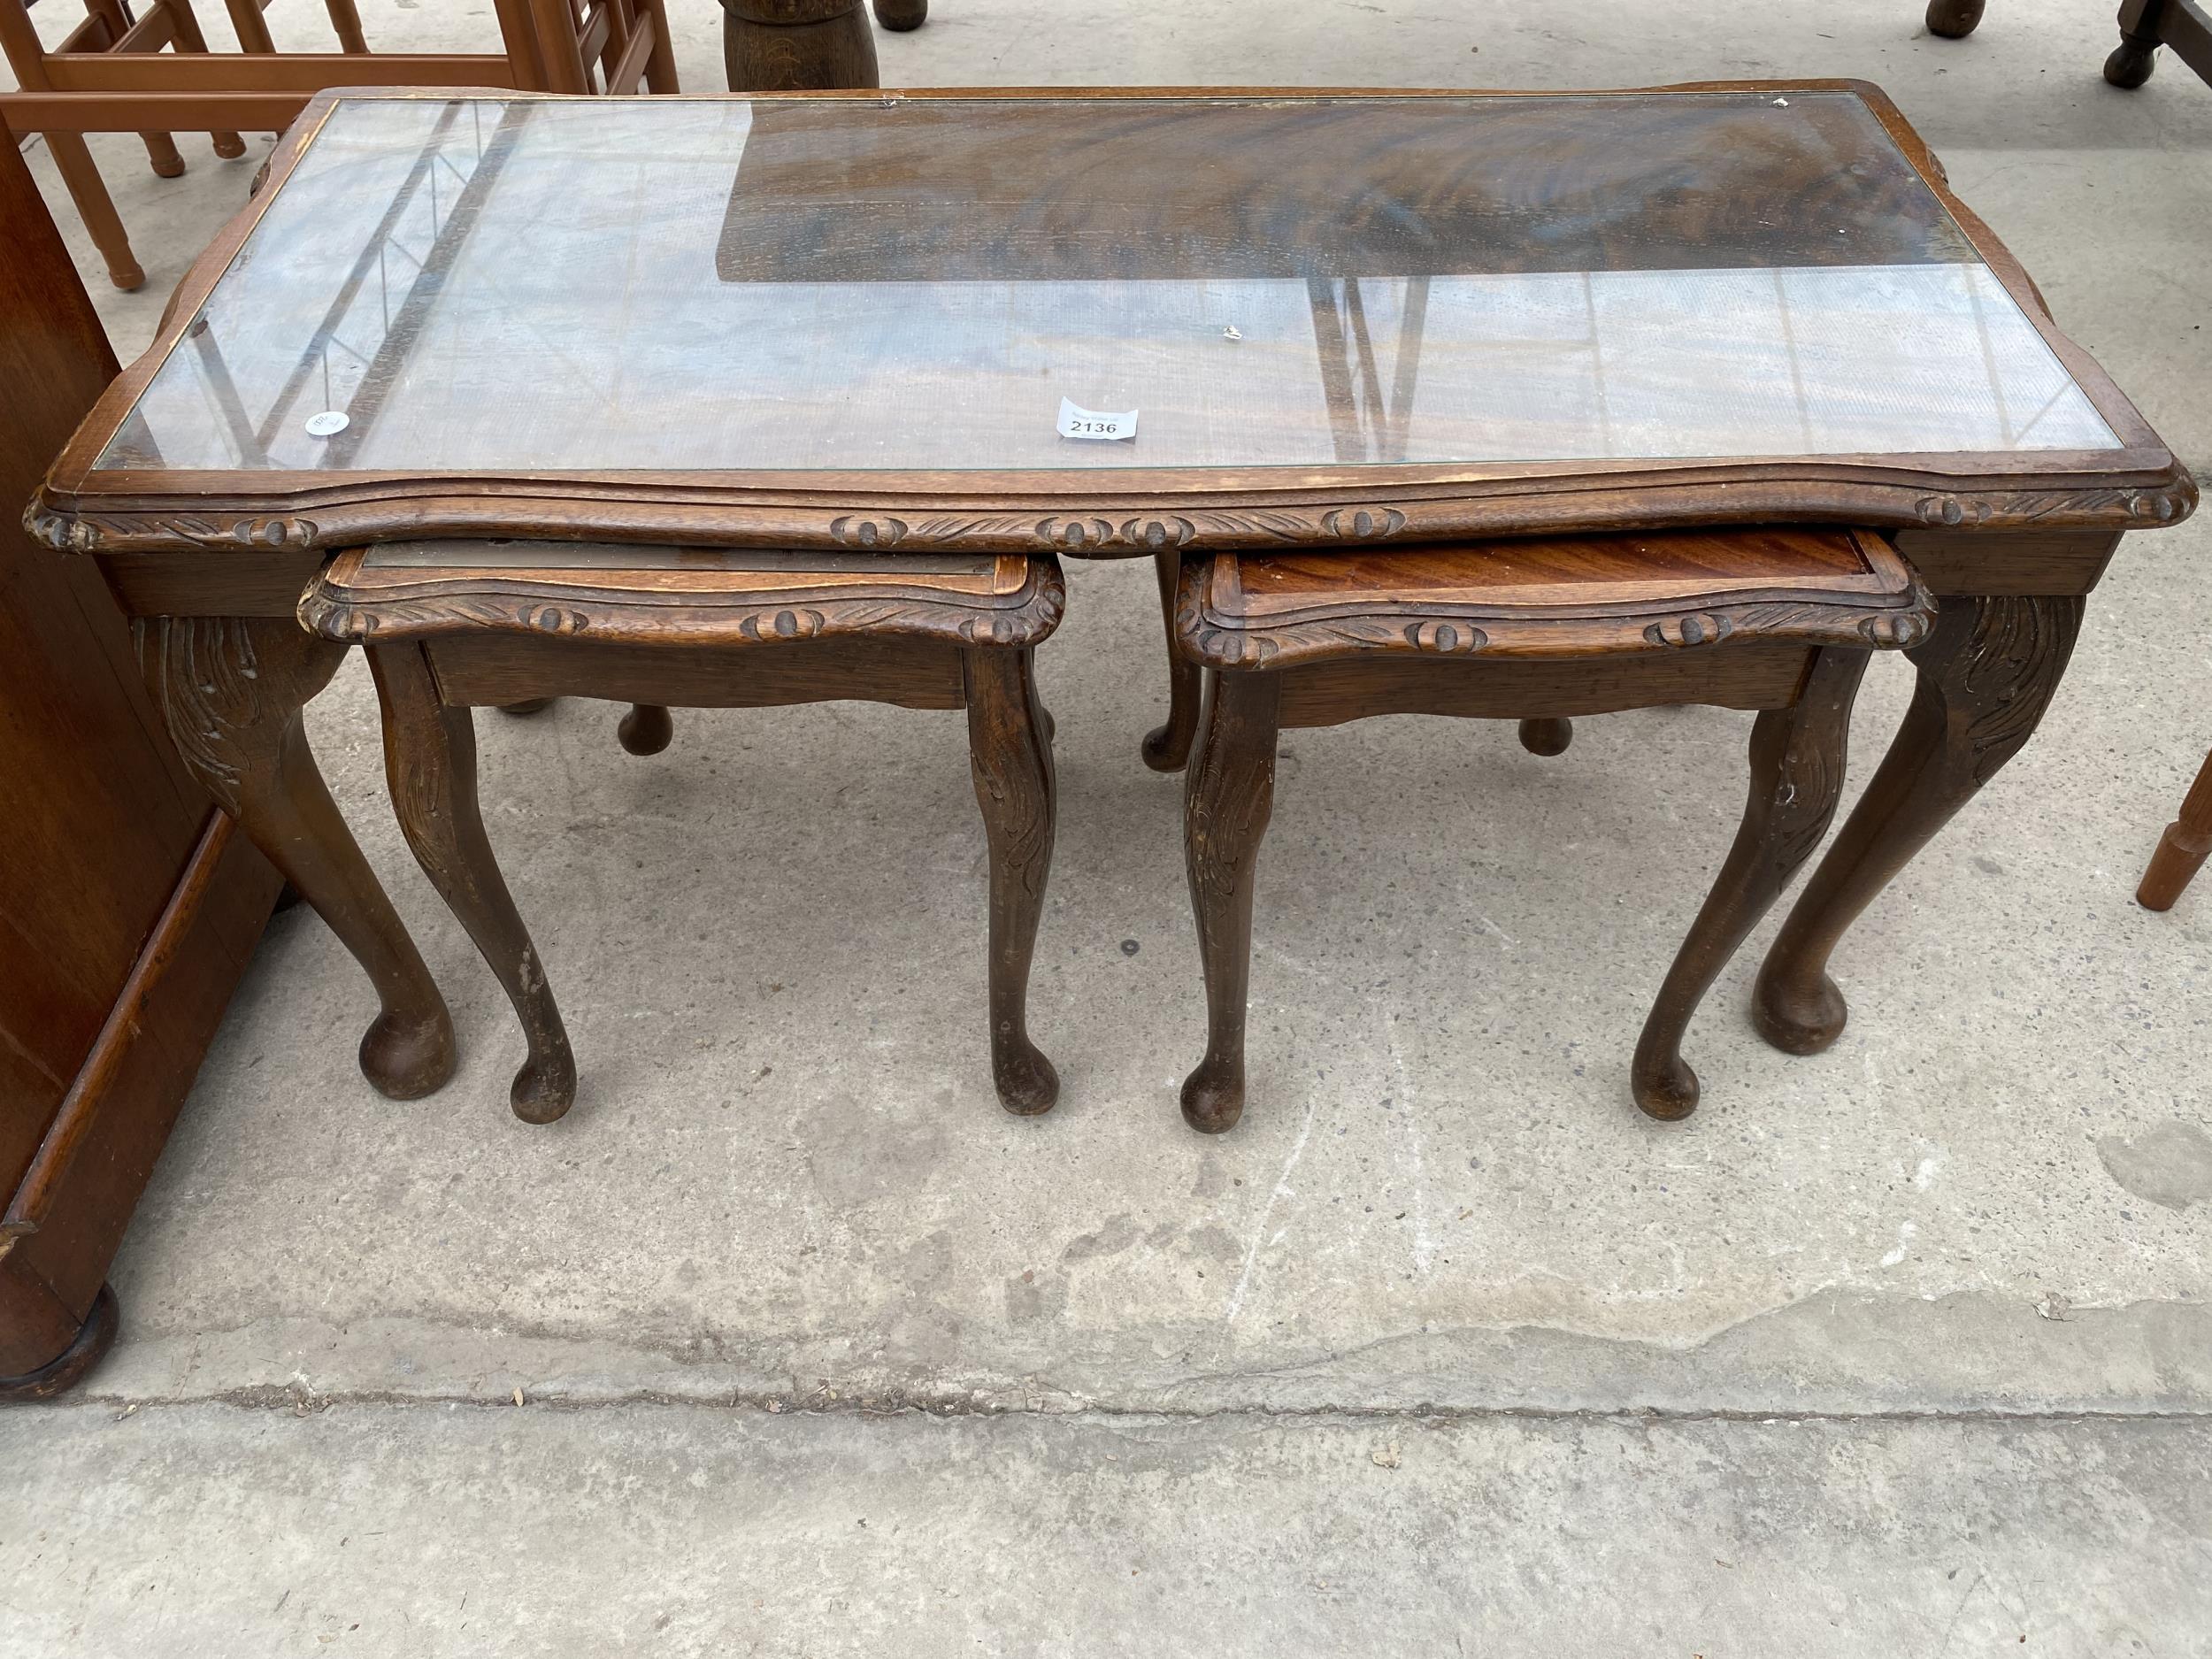 NEST OF THREE MODERN TABLES